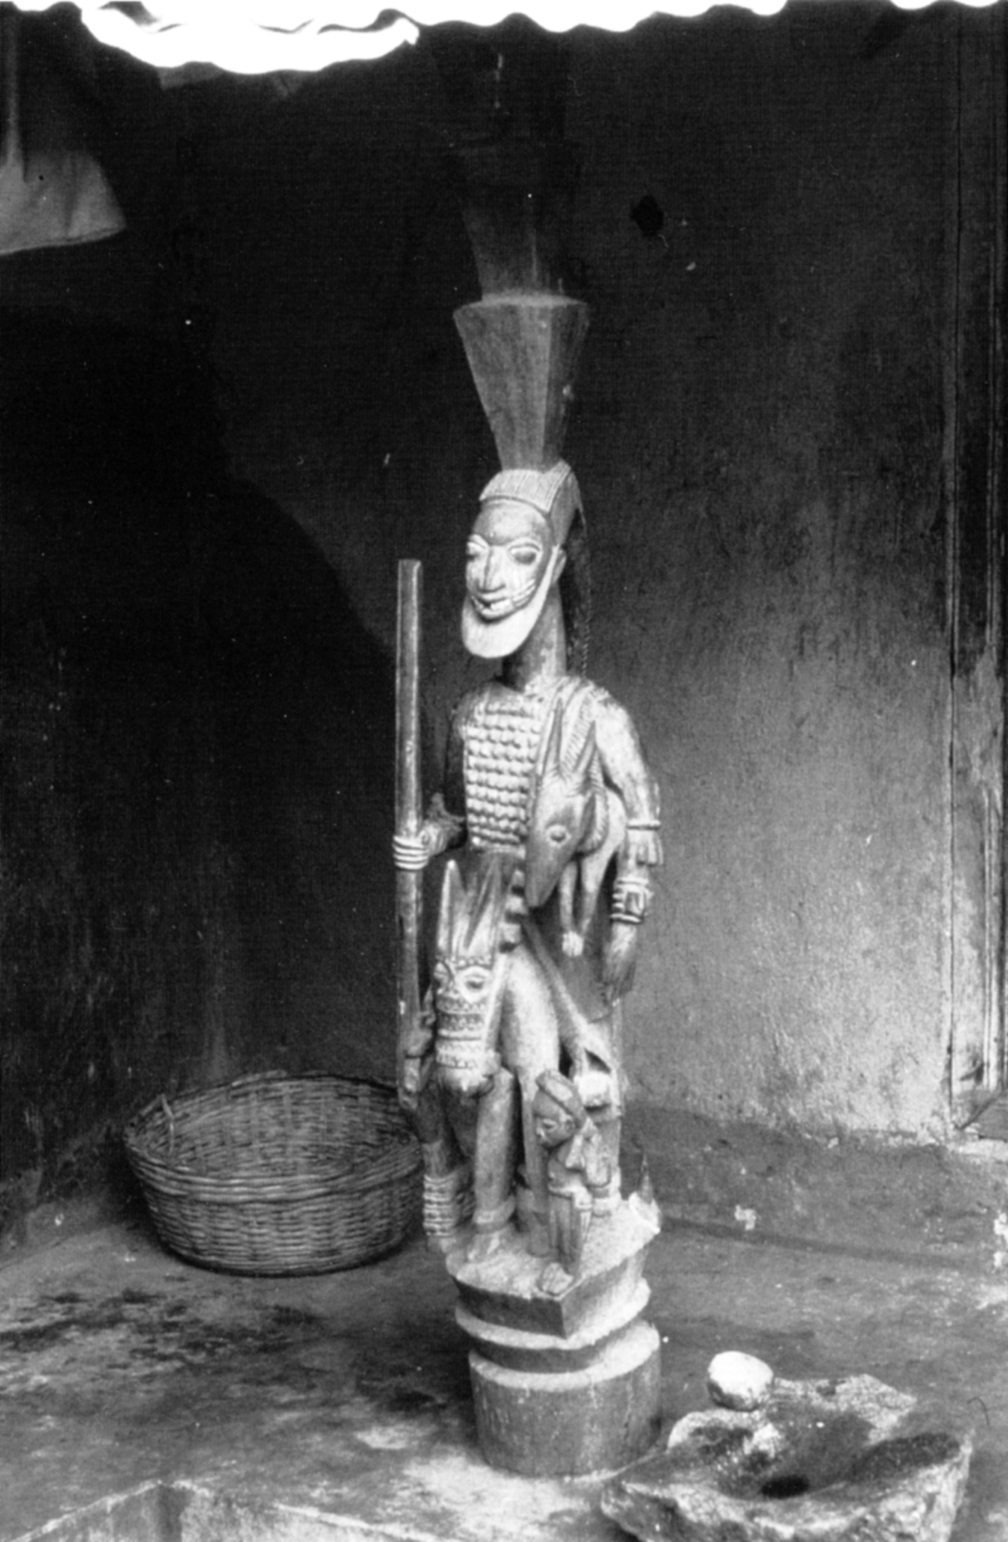 "In situ photo of a Yoruba veranda post by Olowe of Ise - published in Walker (Roslyn Adele), ""Olówè of Isè. A Yoruba Sculptor to Kings"", National Museum of African Art, Smithsonian Institution, Washington, D.C., 1998."